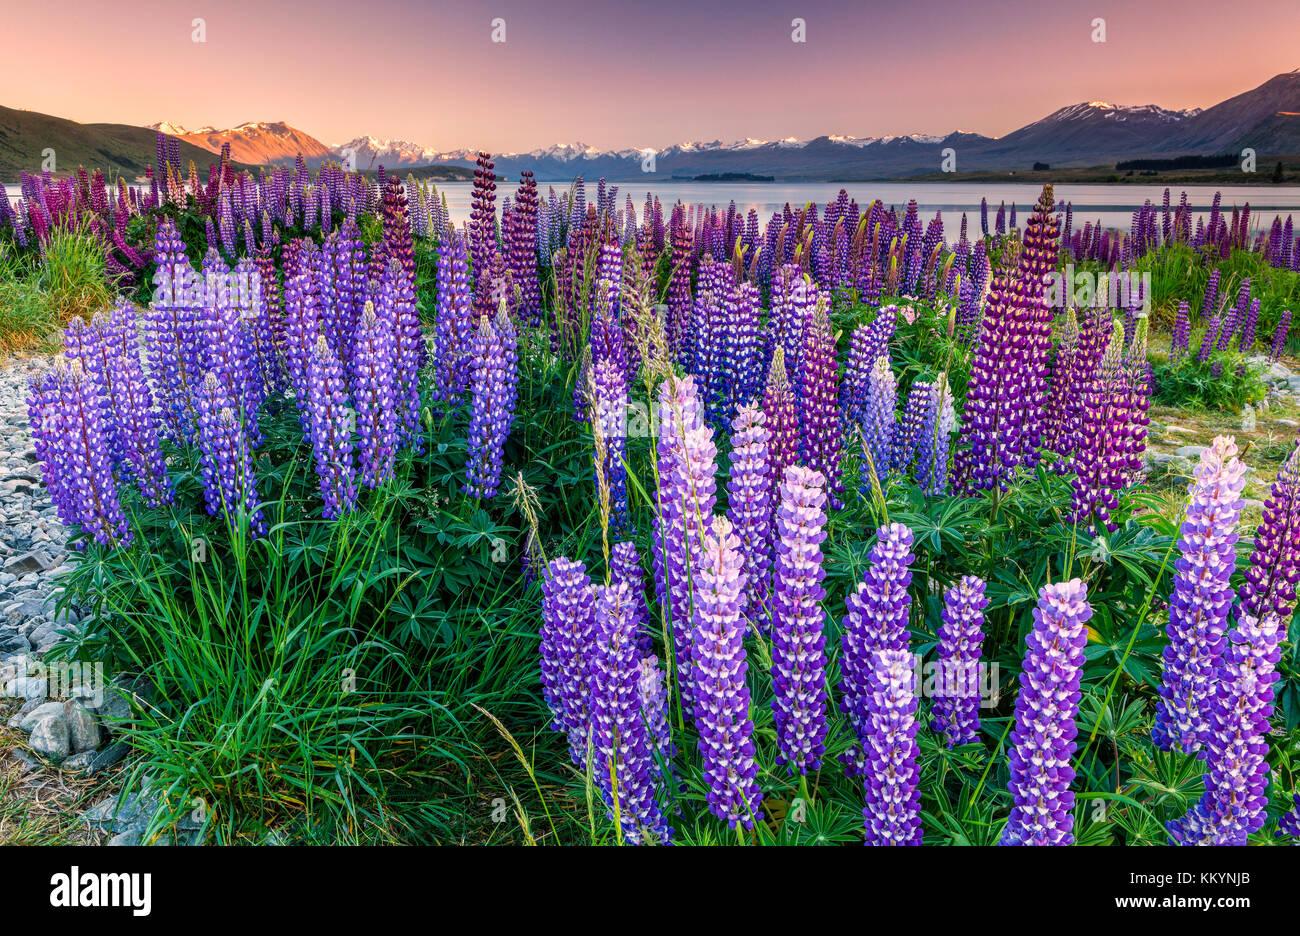 Die lupinen am Lake Tekapo, Mackenzie Country, Neuseeland. Stockbild